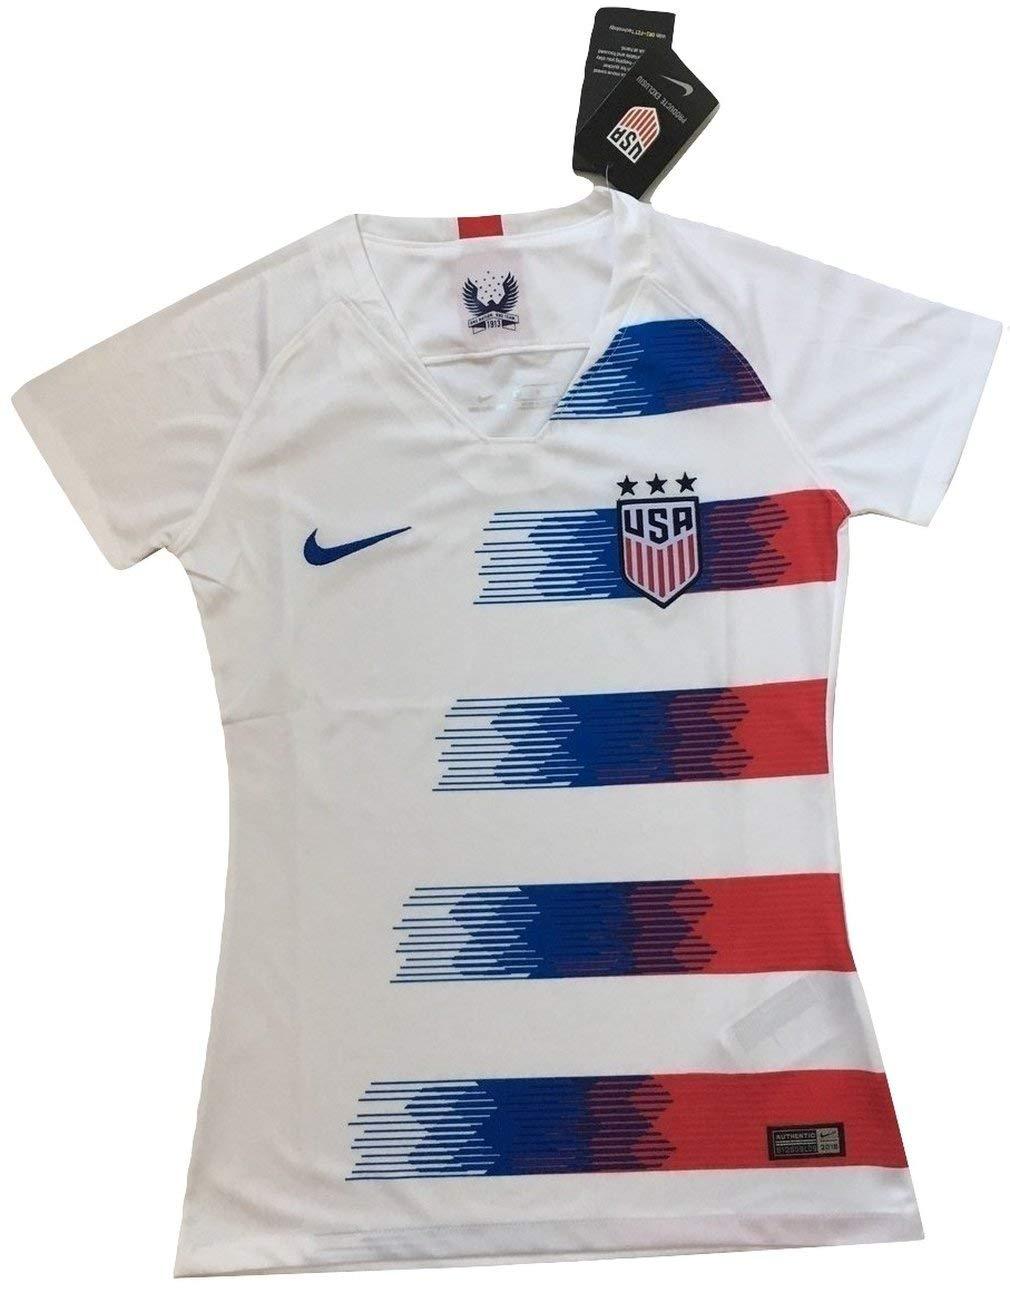 bb38516a6 Get Quotations · Mallnkakova Women s USA National Team 2018-2019 Home Soccer  Jersey White